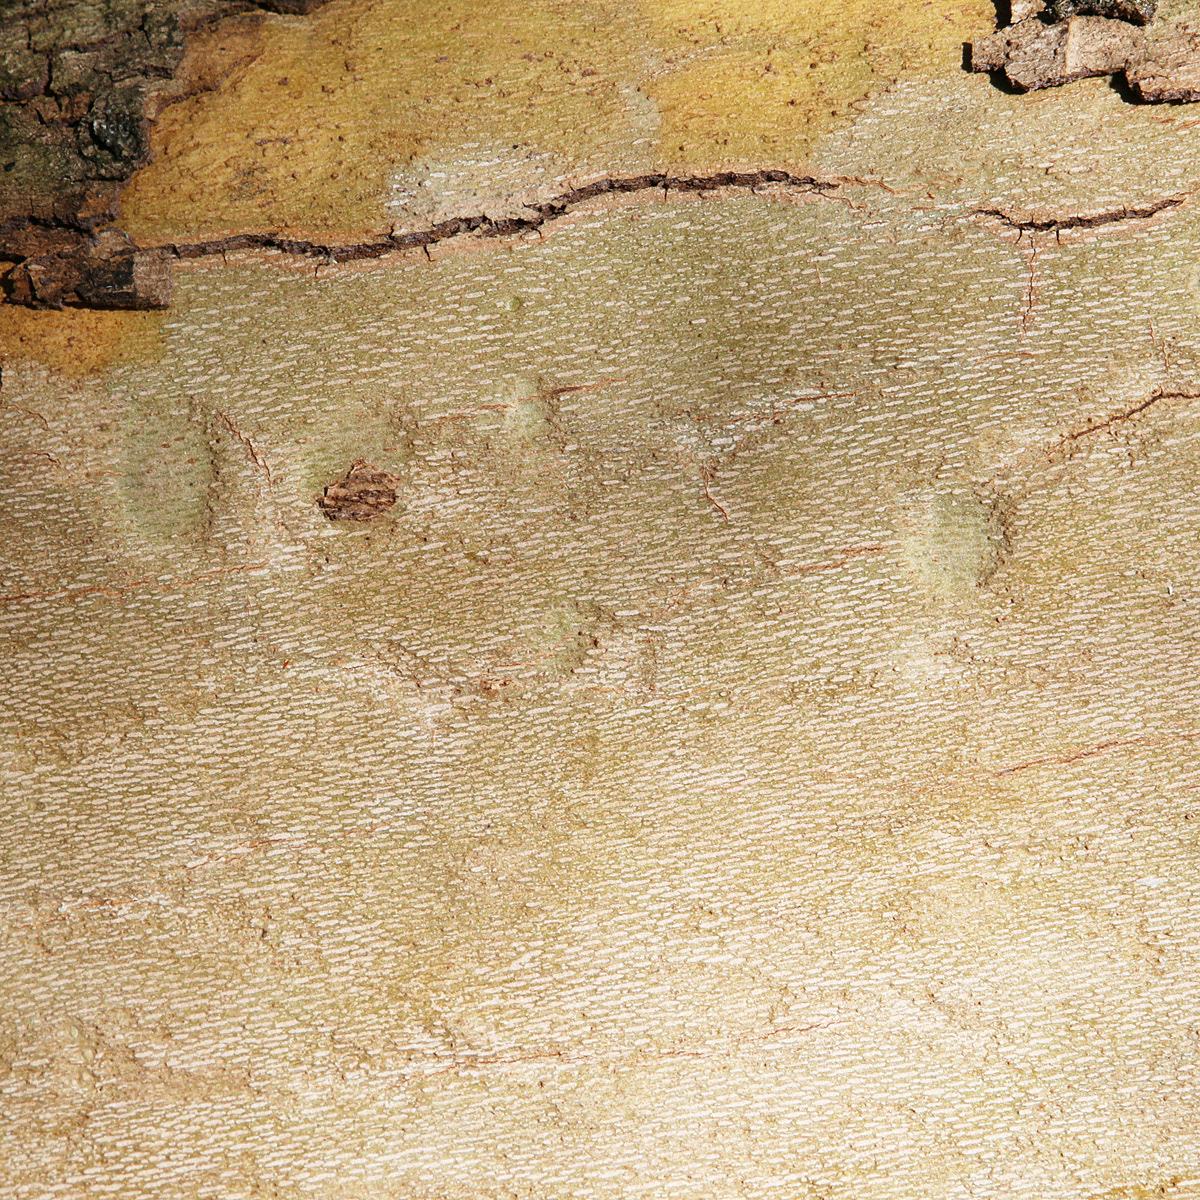 Landscape abstract desert Nature Aerial bark Tree  Volcanoe cave conceptual